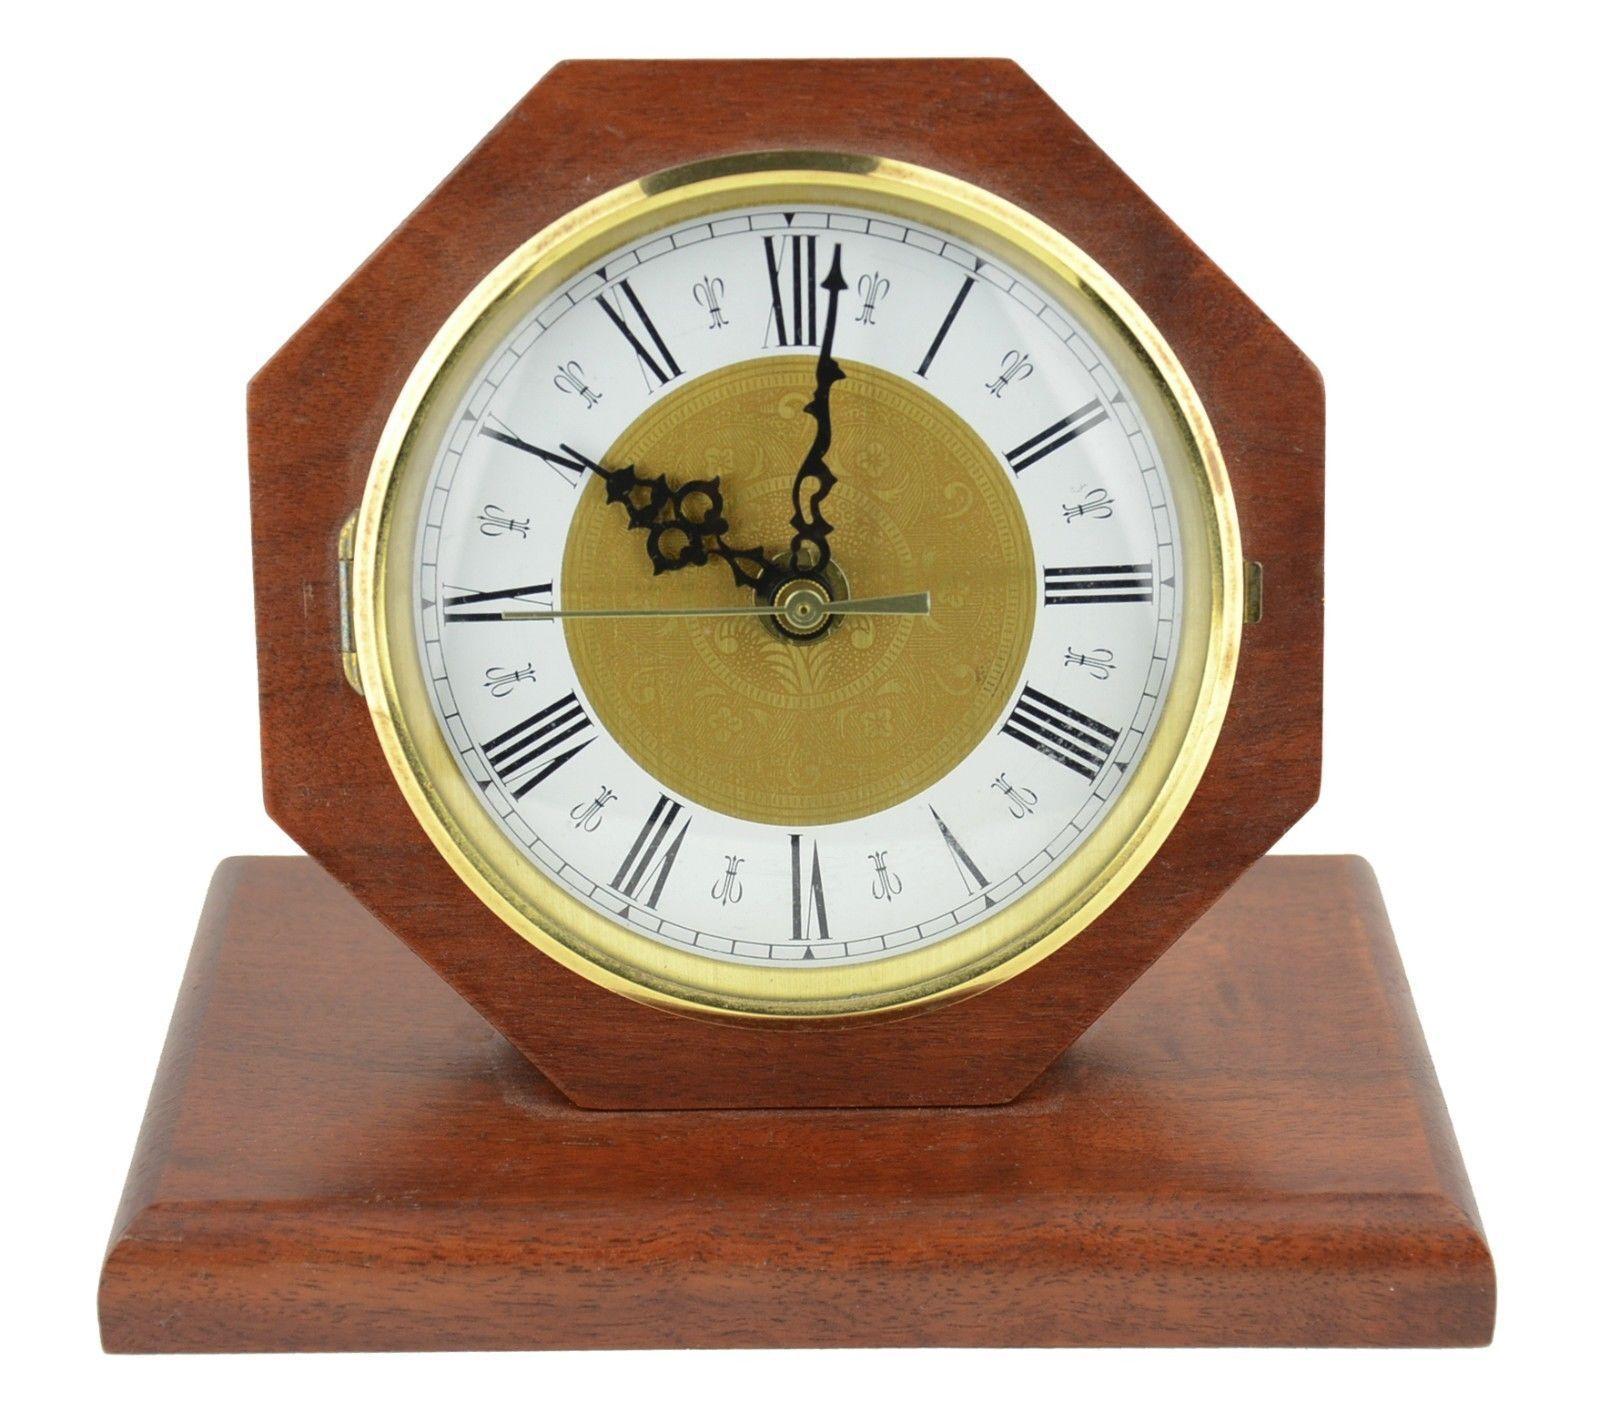 Collectible Vintage Clocks 1930 1969 For Sale Ebay